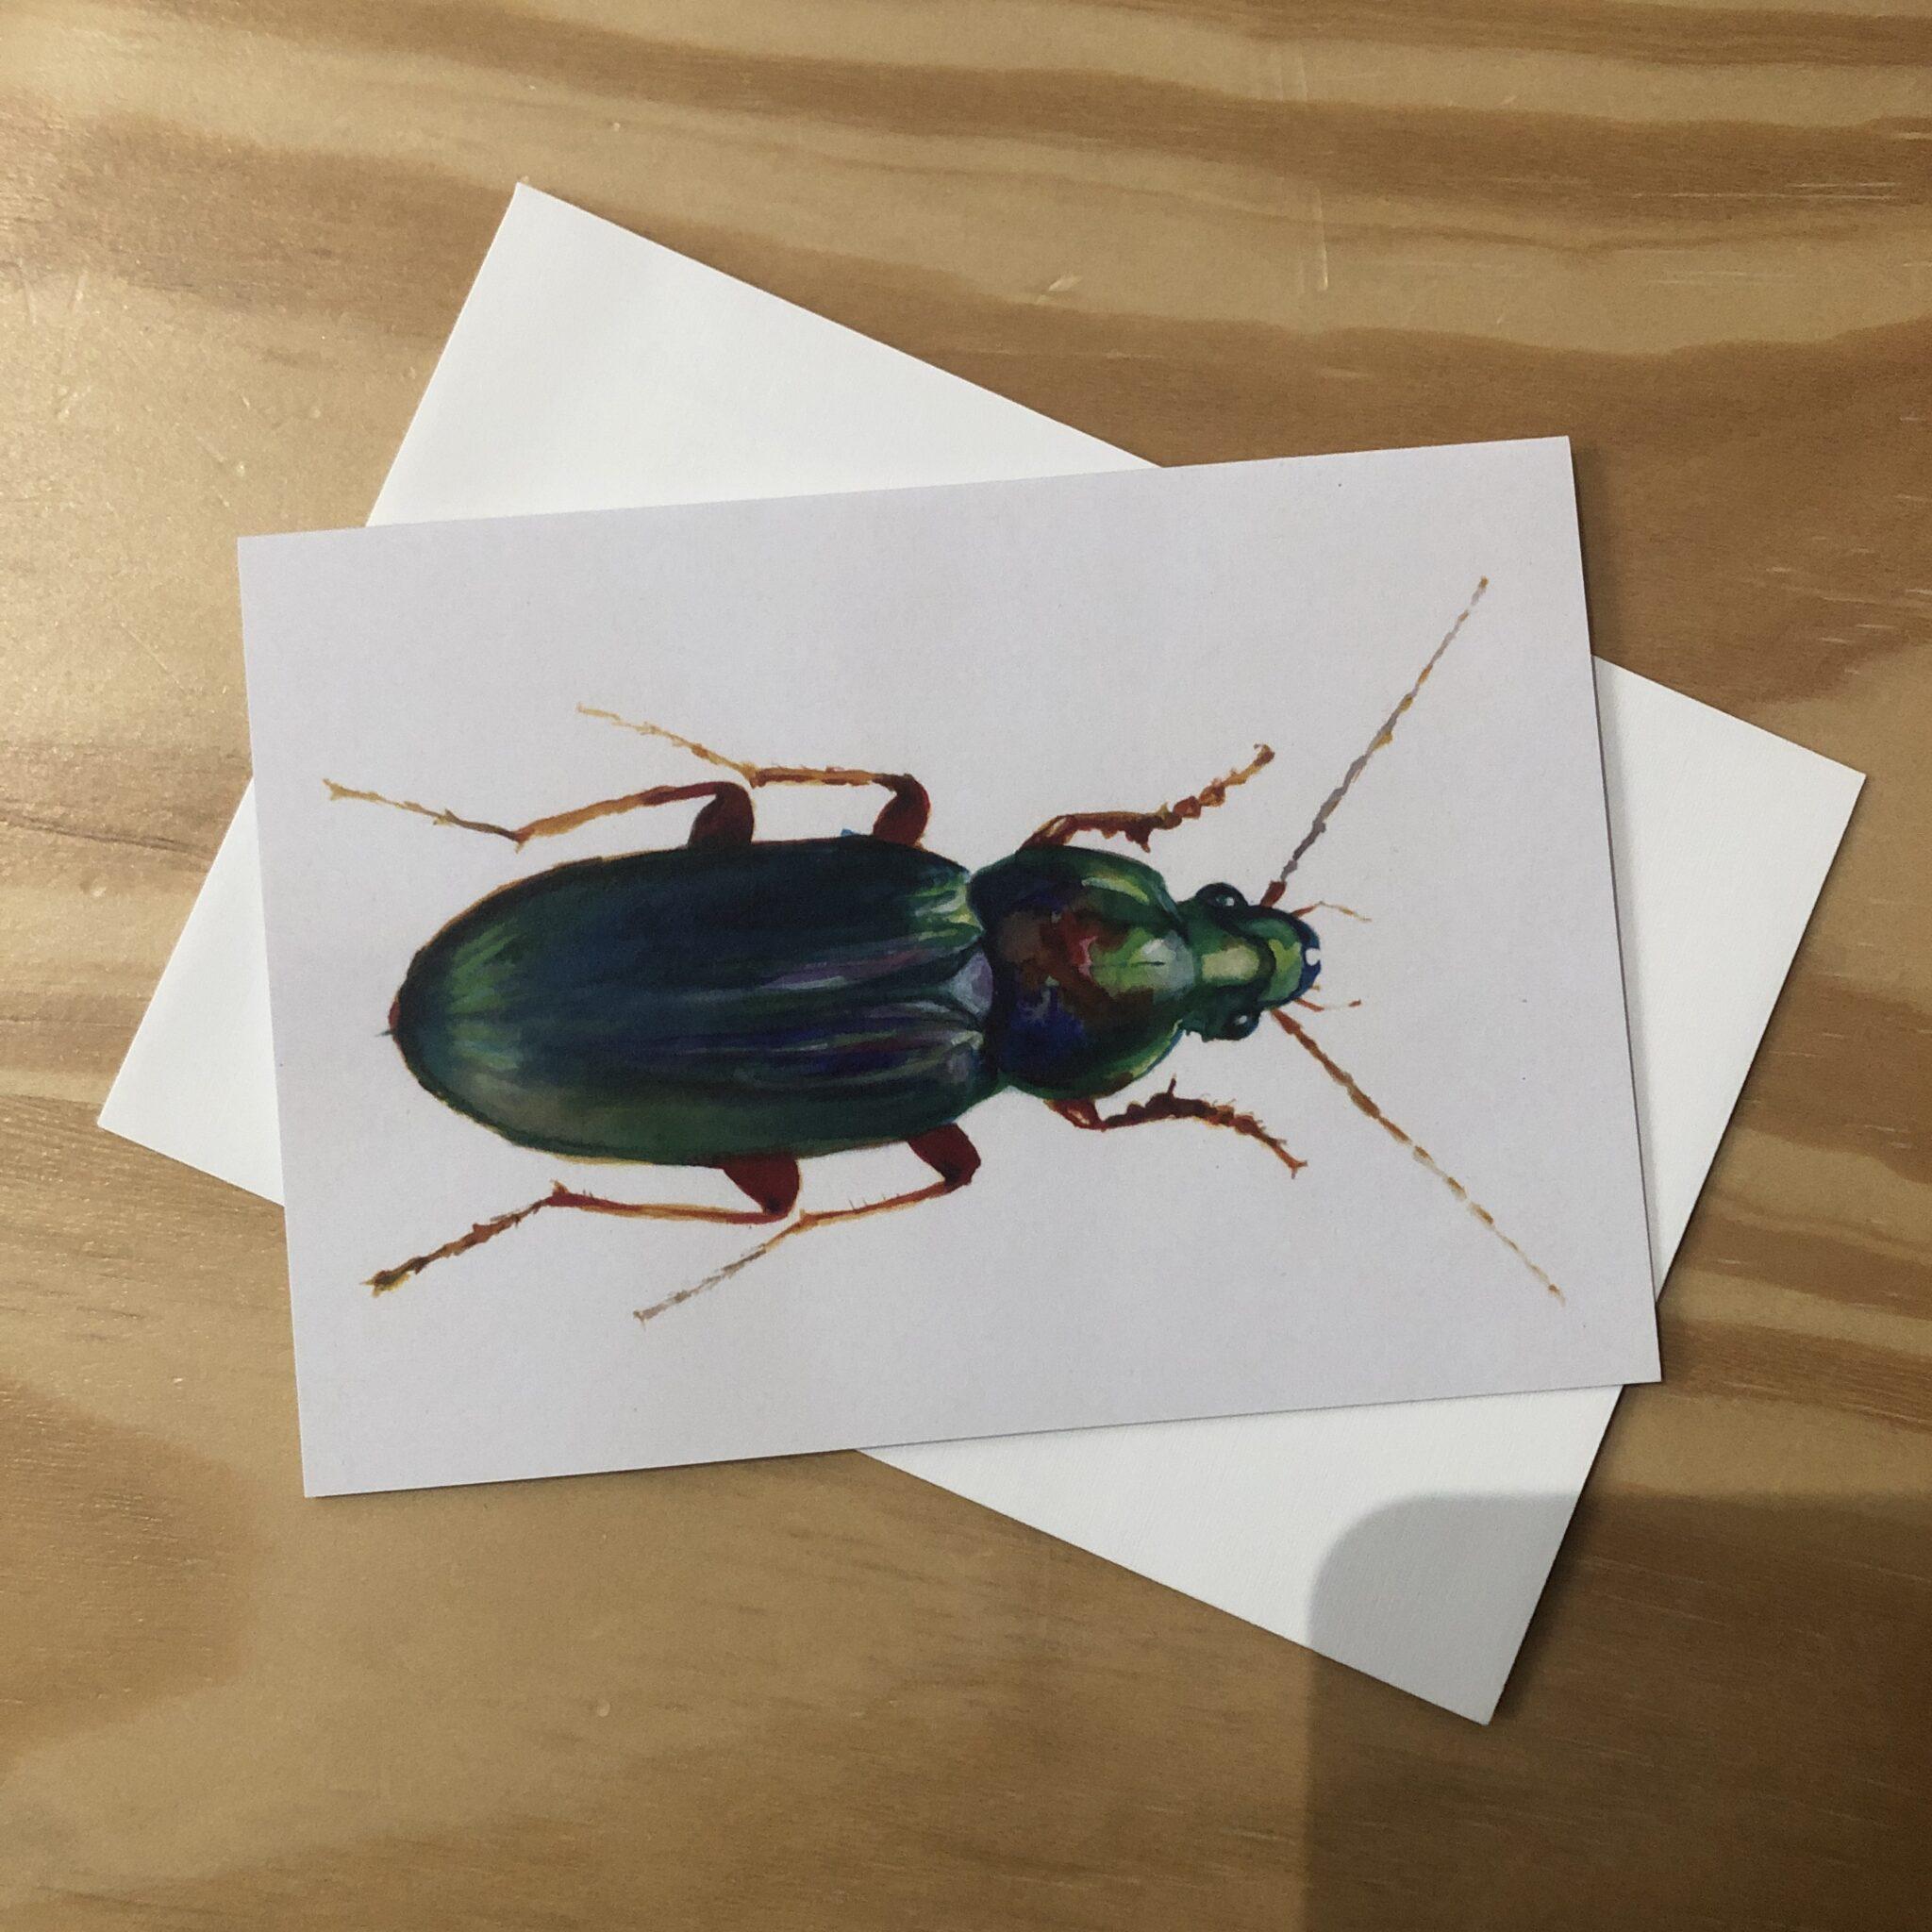 Ground Beetle Greeting Card By Skye O'Shea (Prahran)